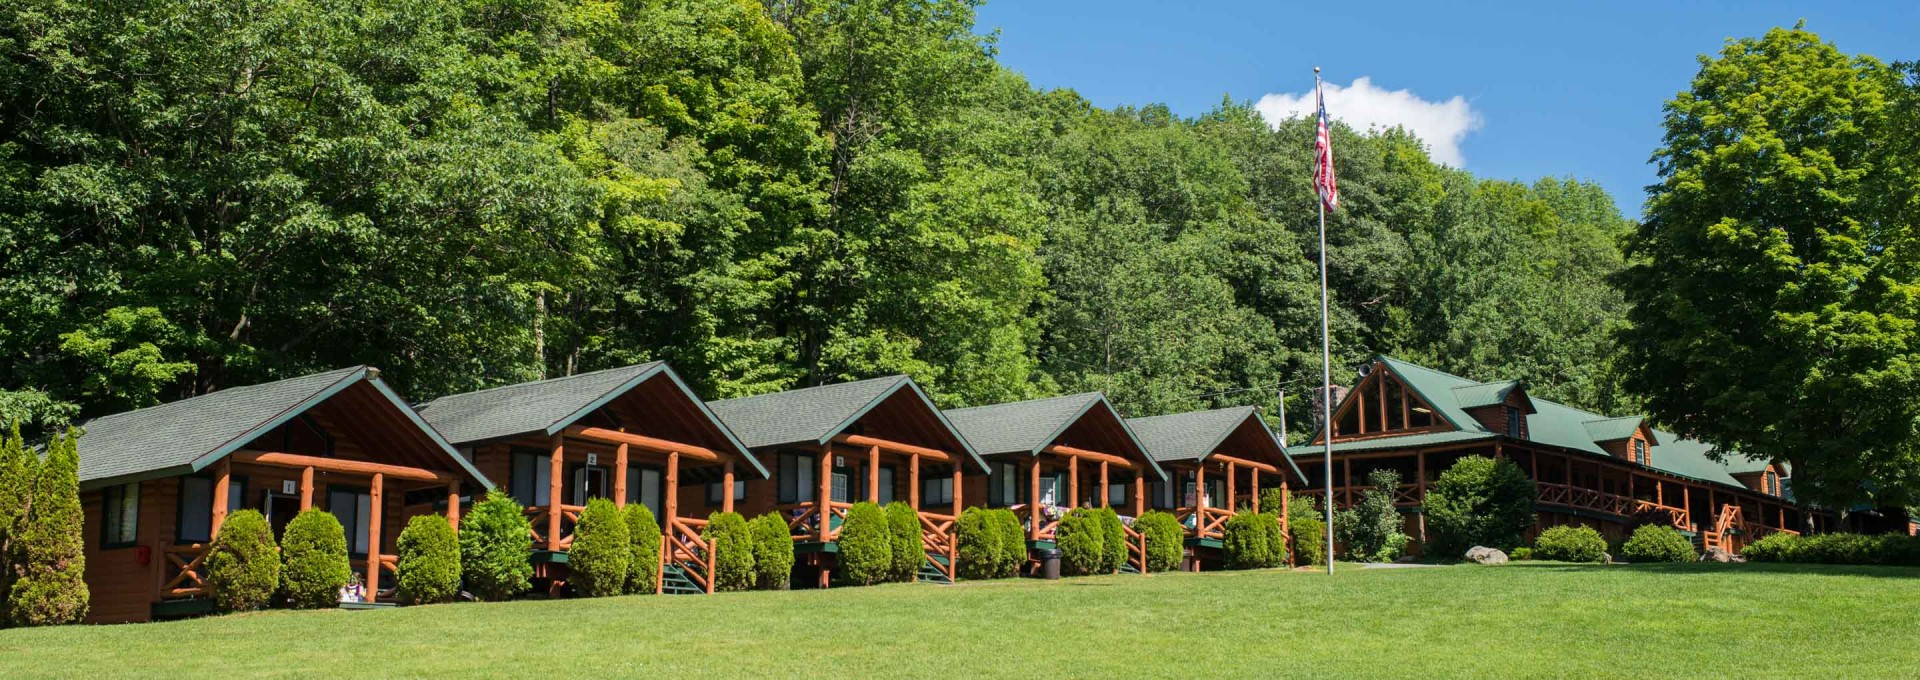 Camp Accommodations.jpg